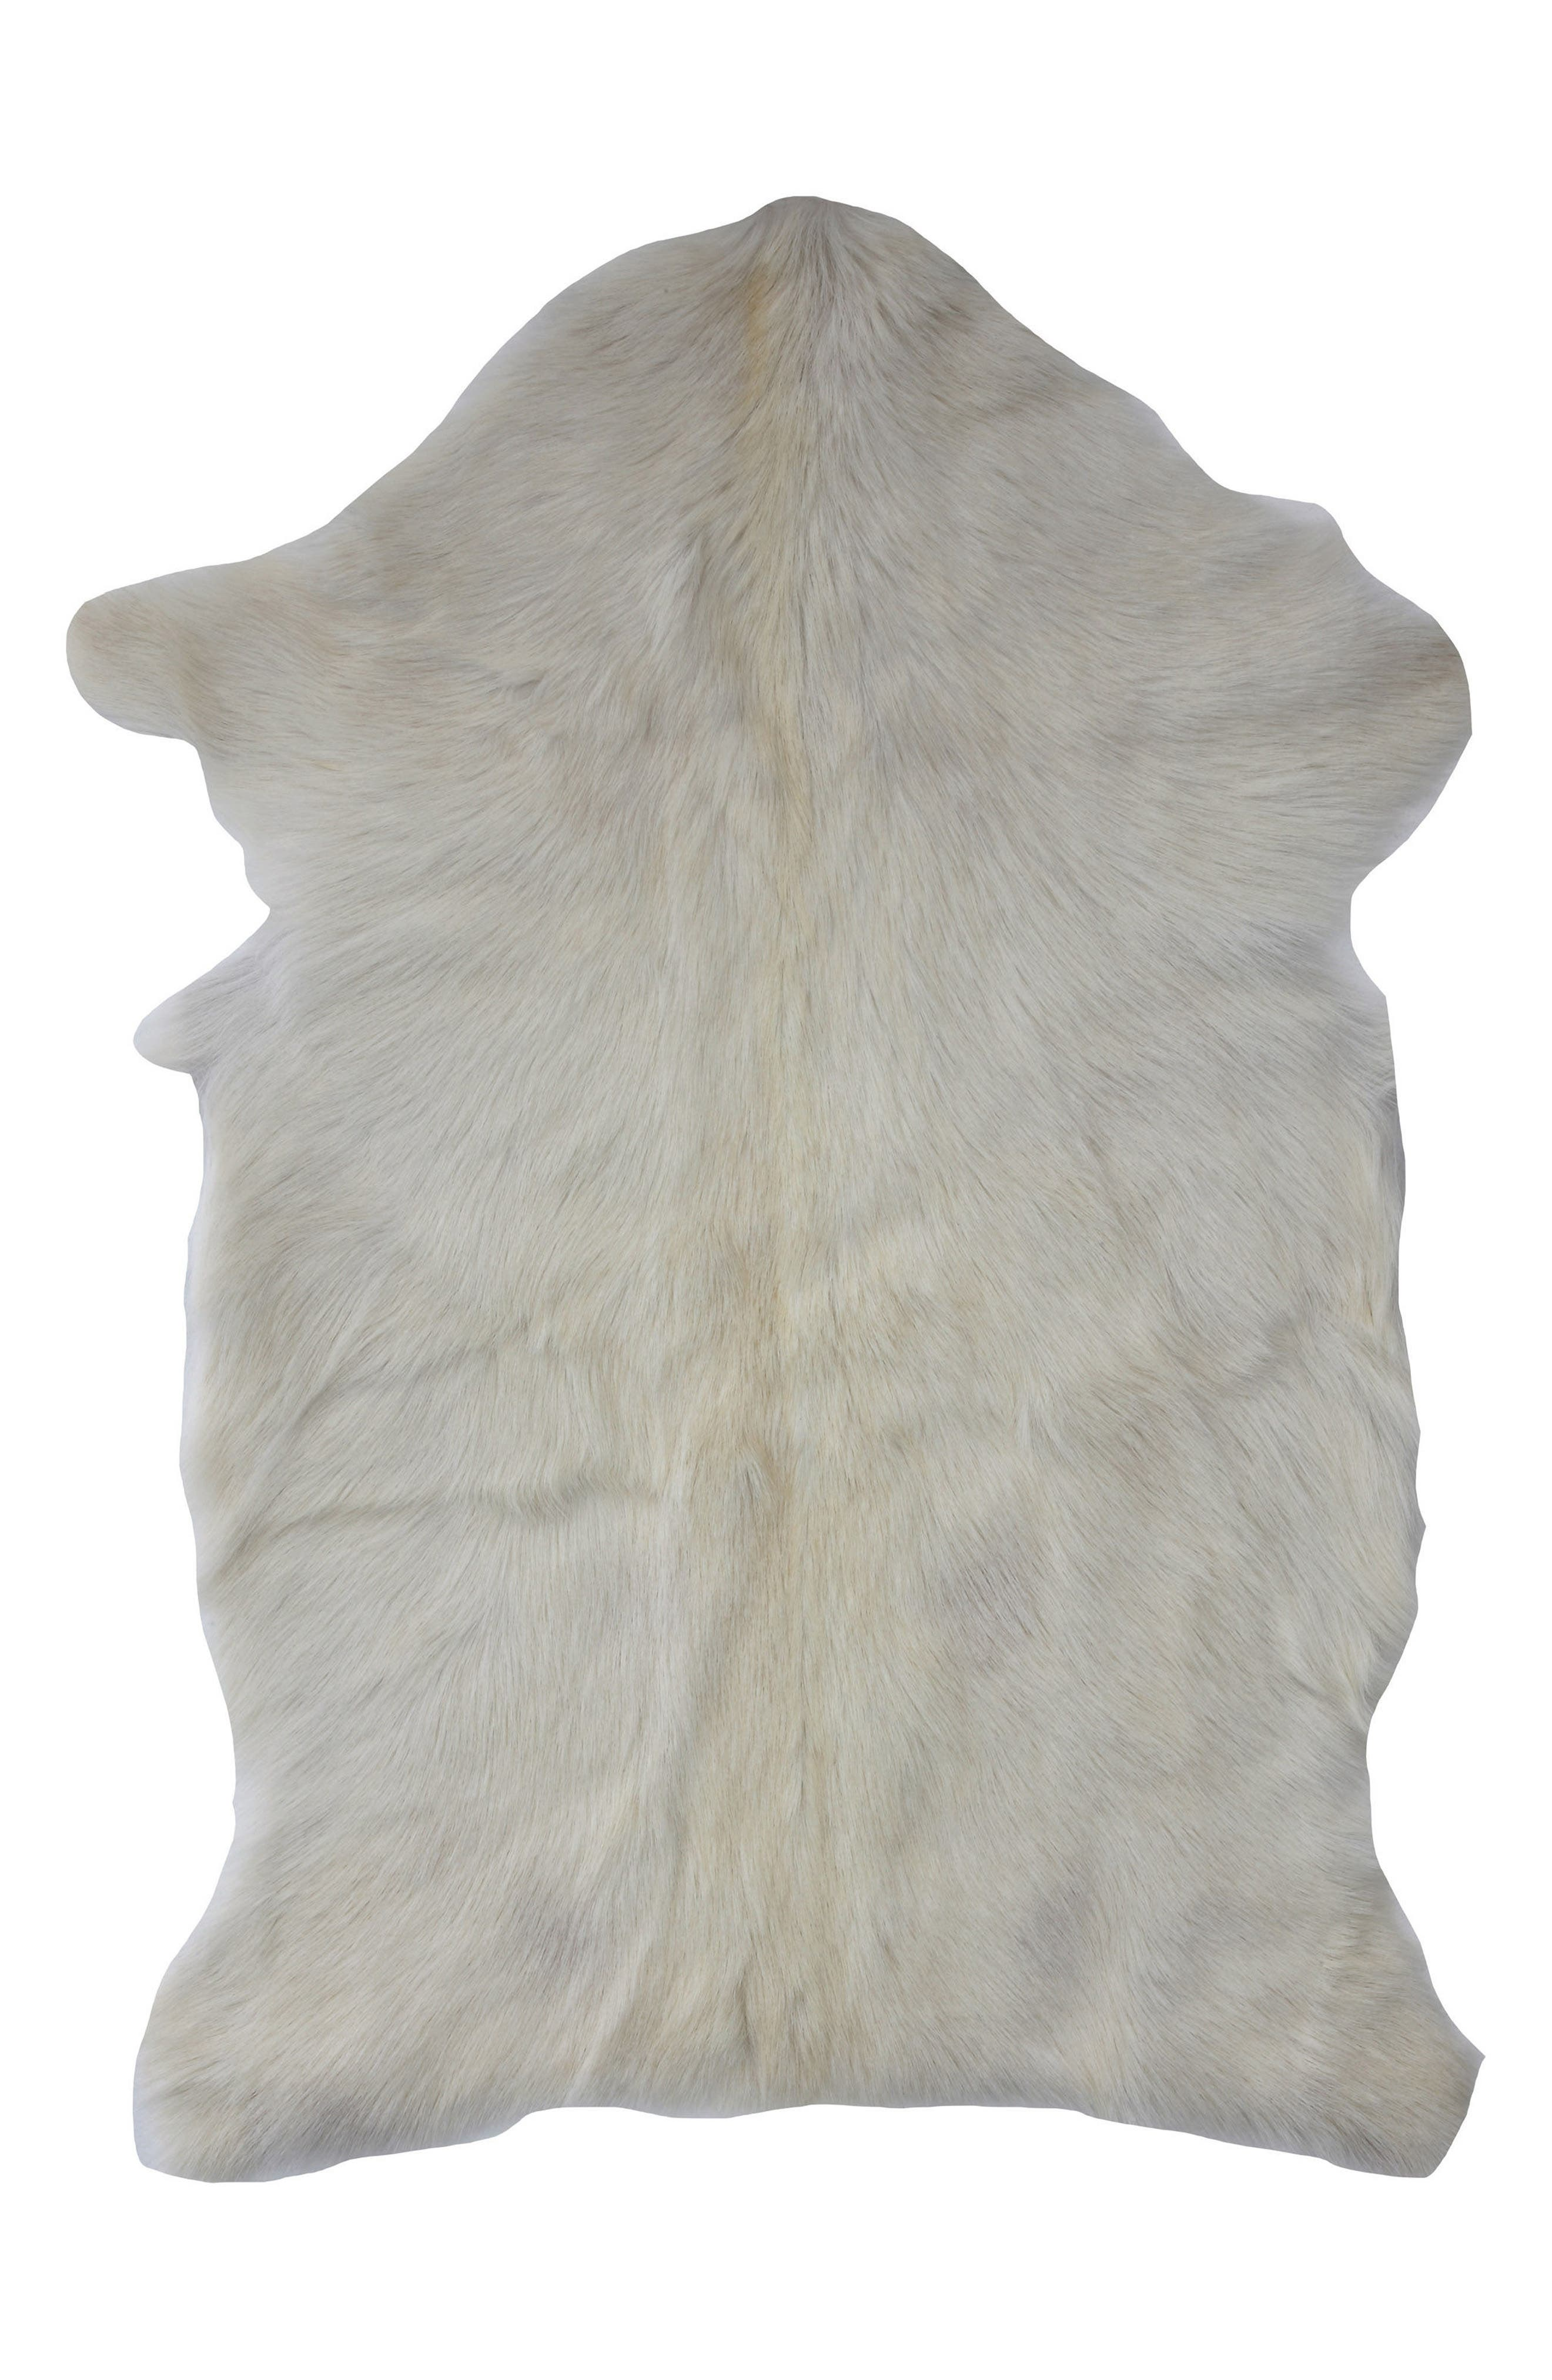 Genuine Goat Hair Rug,                             Main thumbnail 1, color,                             100